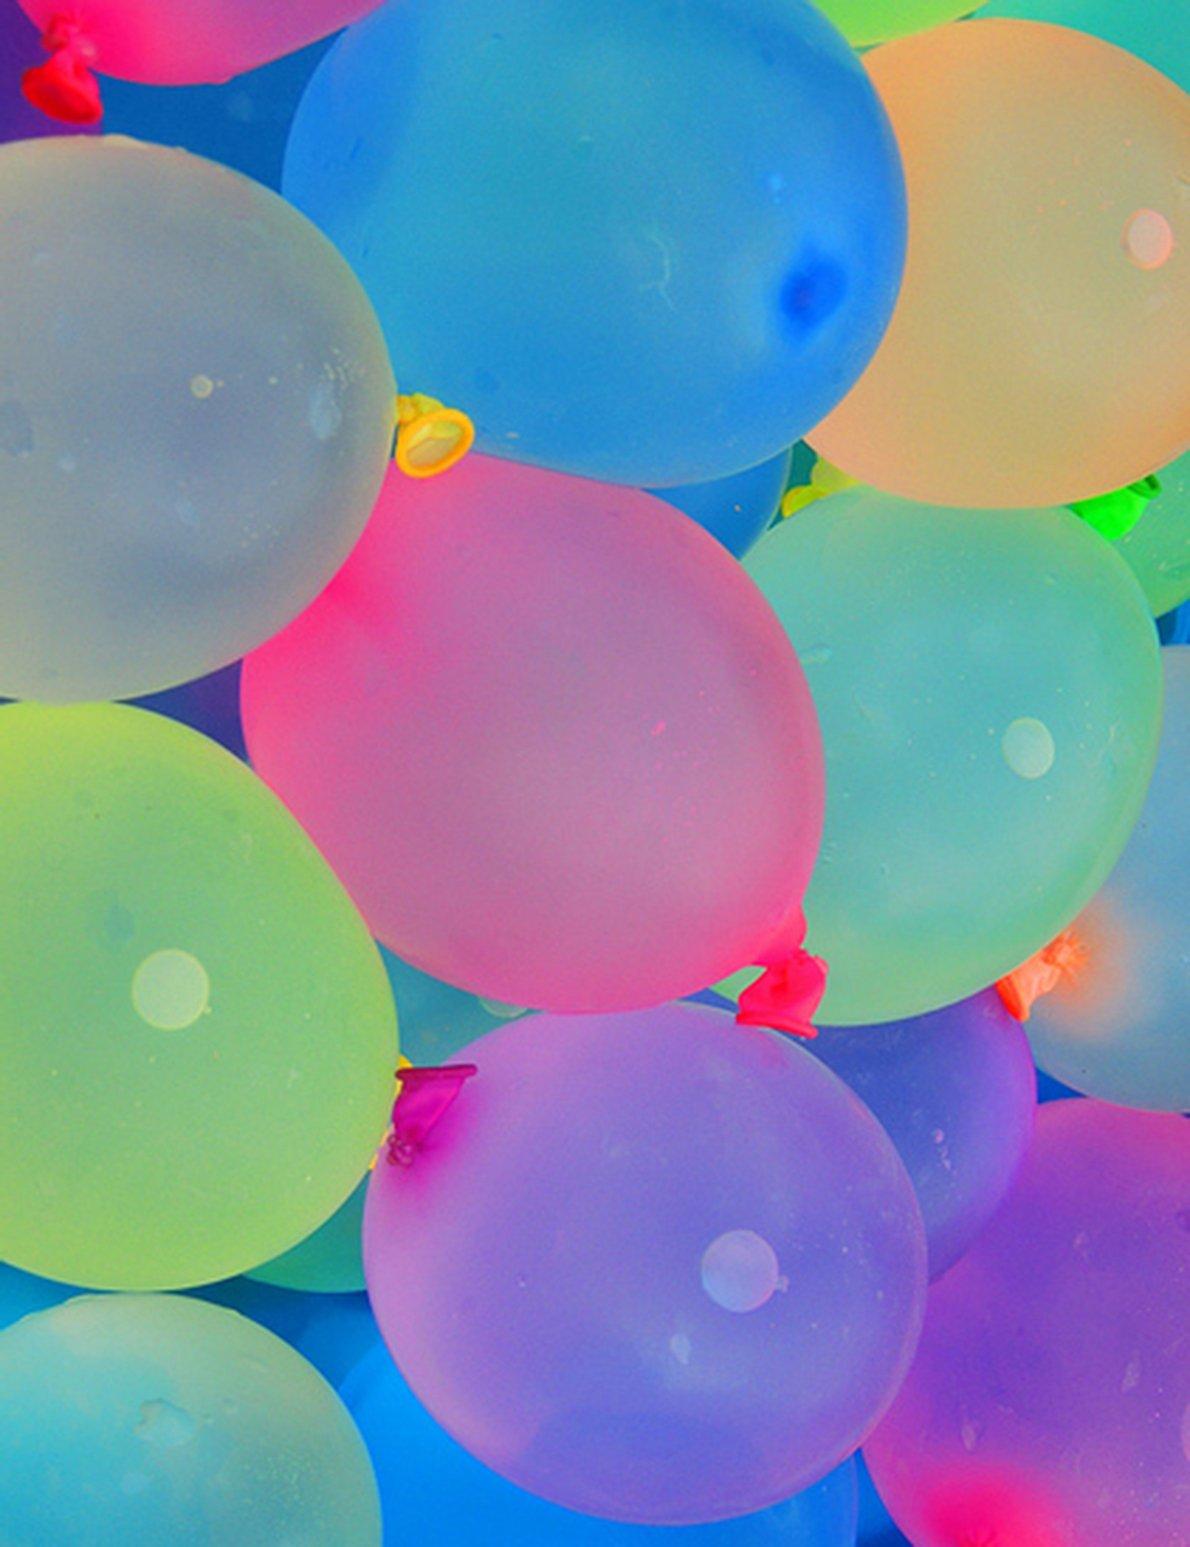 Amazing Water Balloon